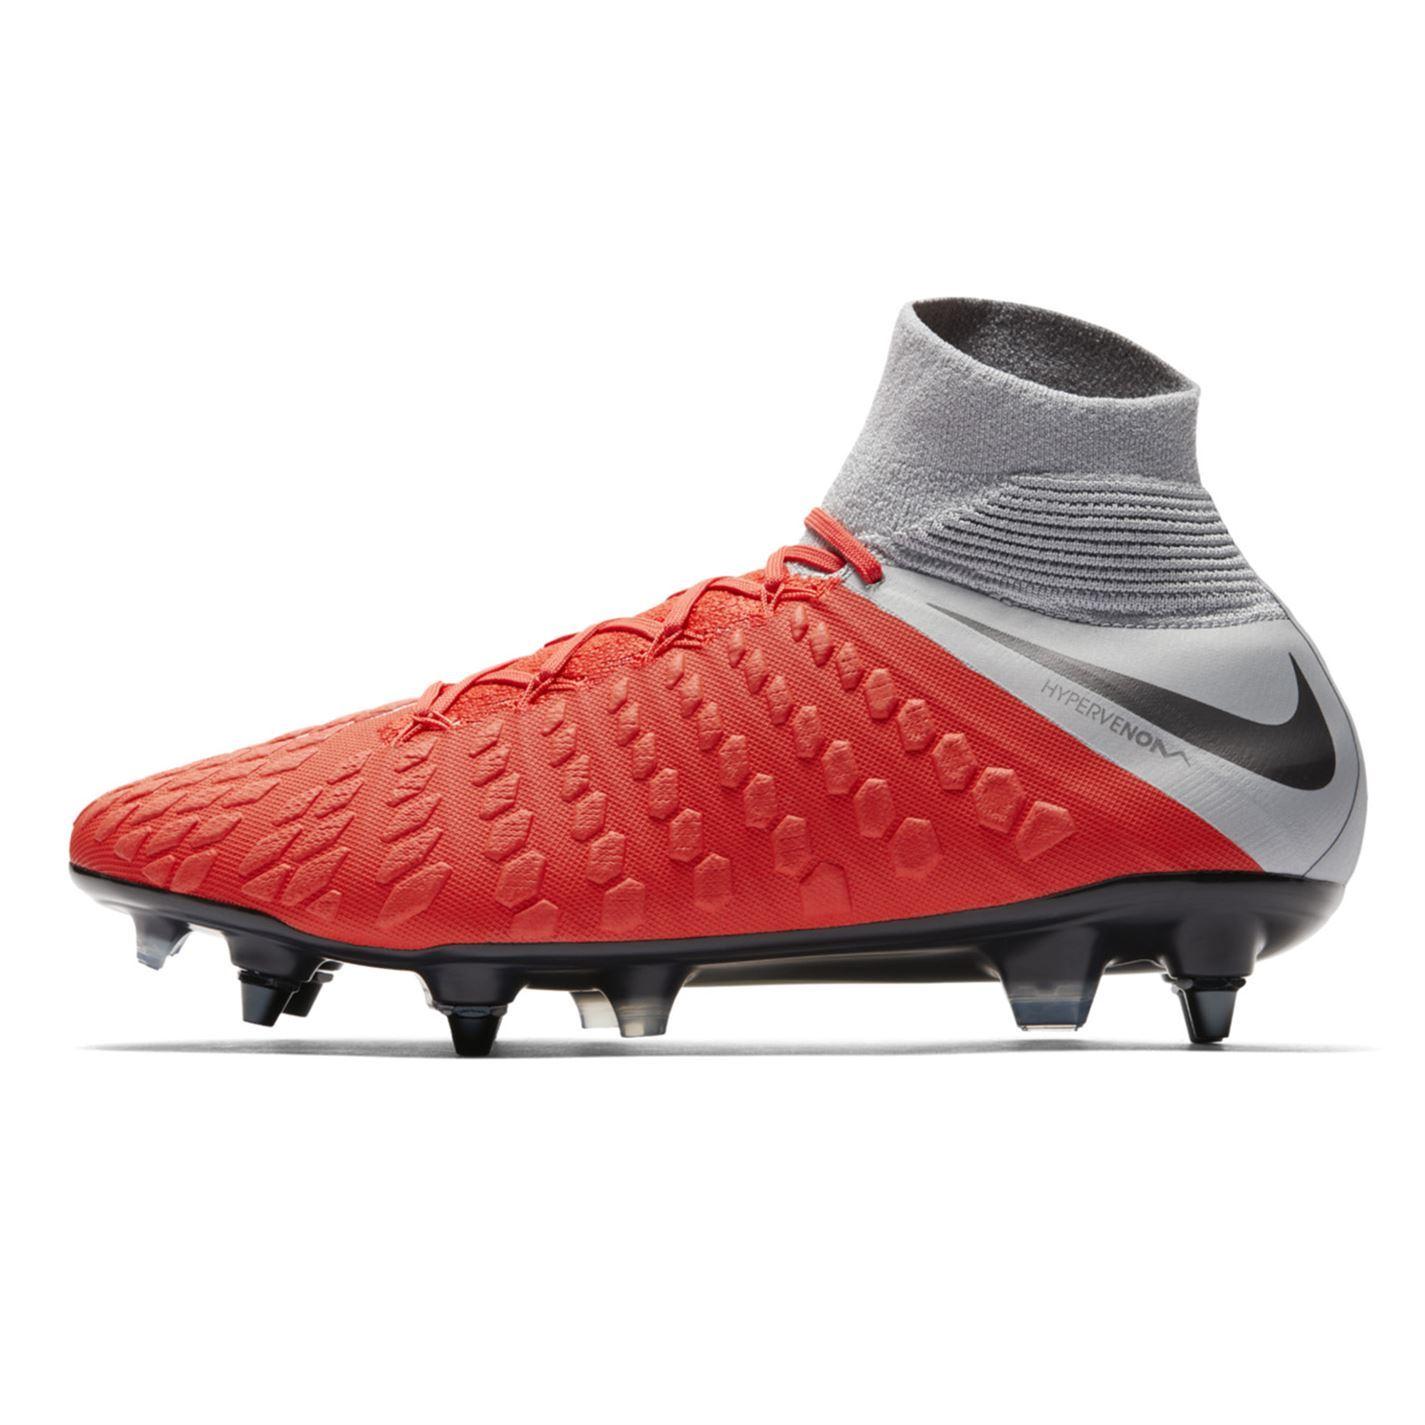 sale retailer 9c4f2 687f5 Details about Nike Hypervenom Phantom Elite Soft Ground Football Boots Mens  Red Soccer Cleats